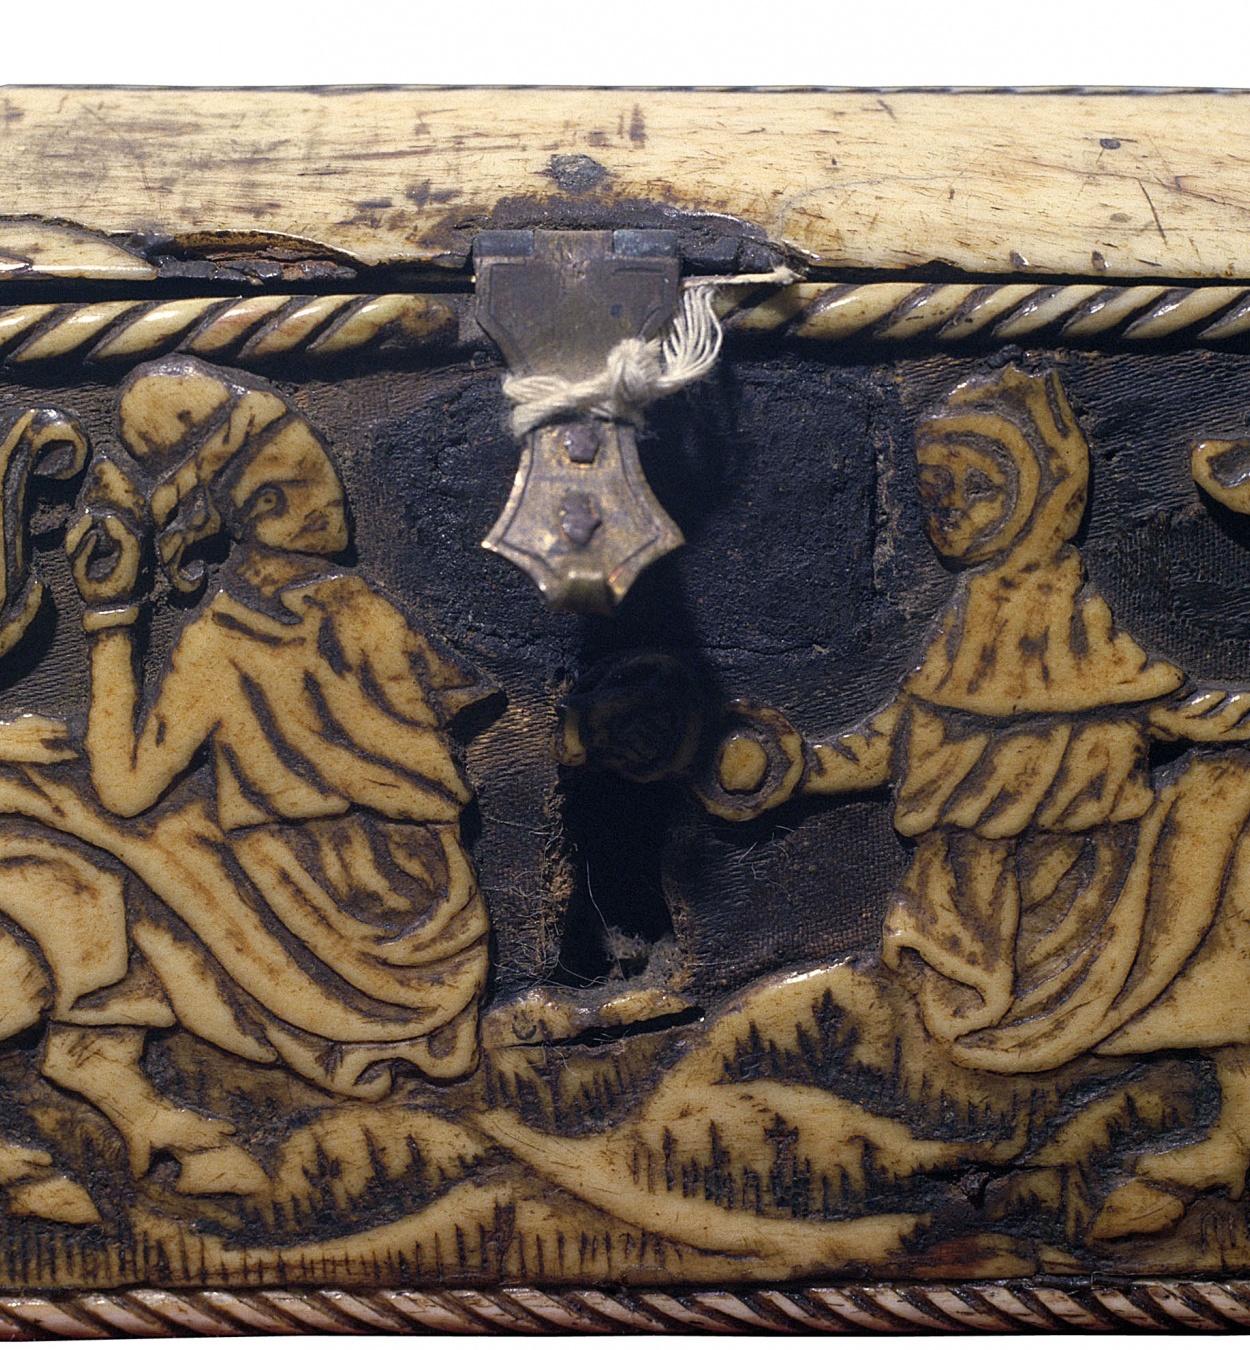 Anònim. França - Capseta amatòria amb dama i unicorn - Segle XV